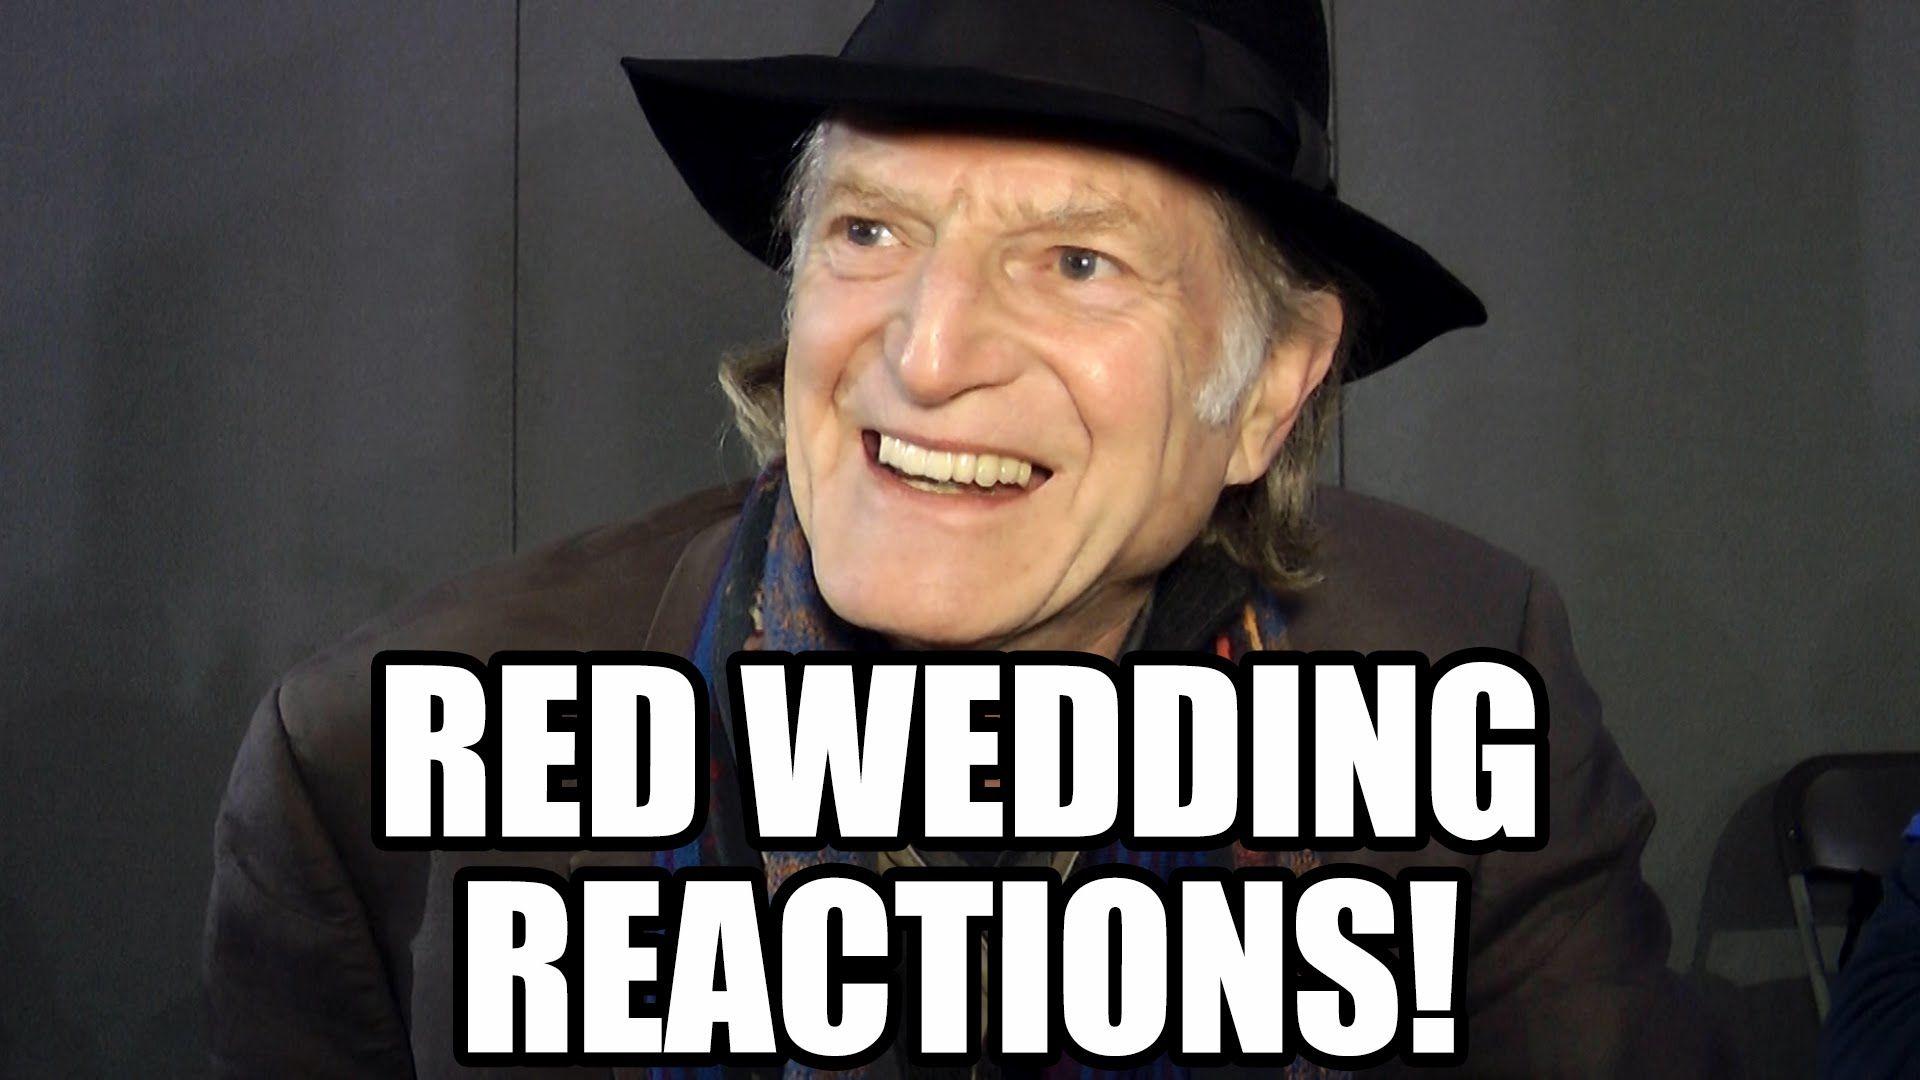 Of Thrones Red Wedding Reactions 2 Walder Frey Ramsay Snow Yara